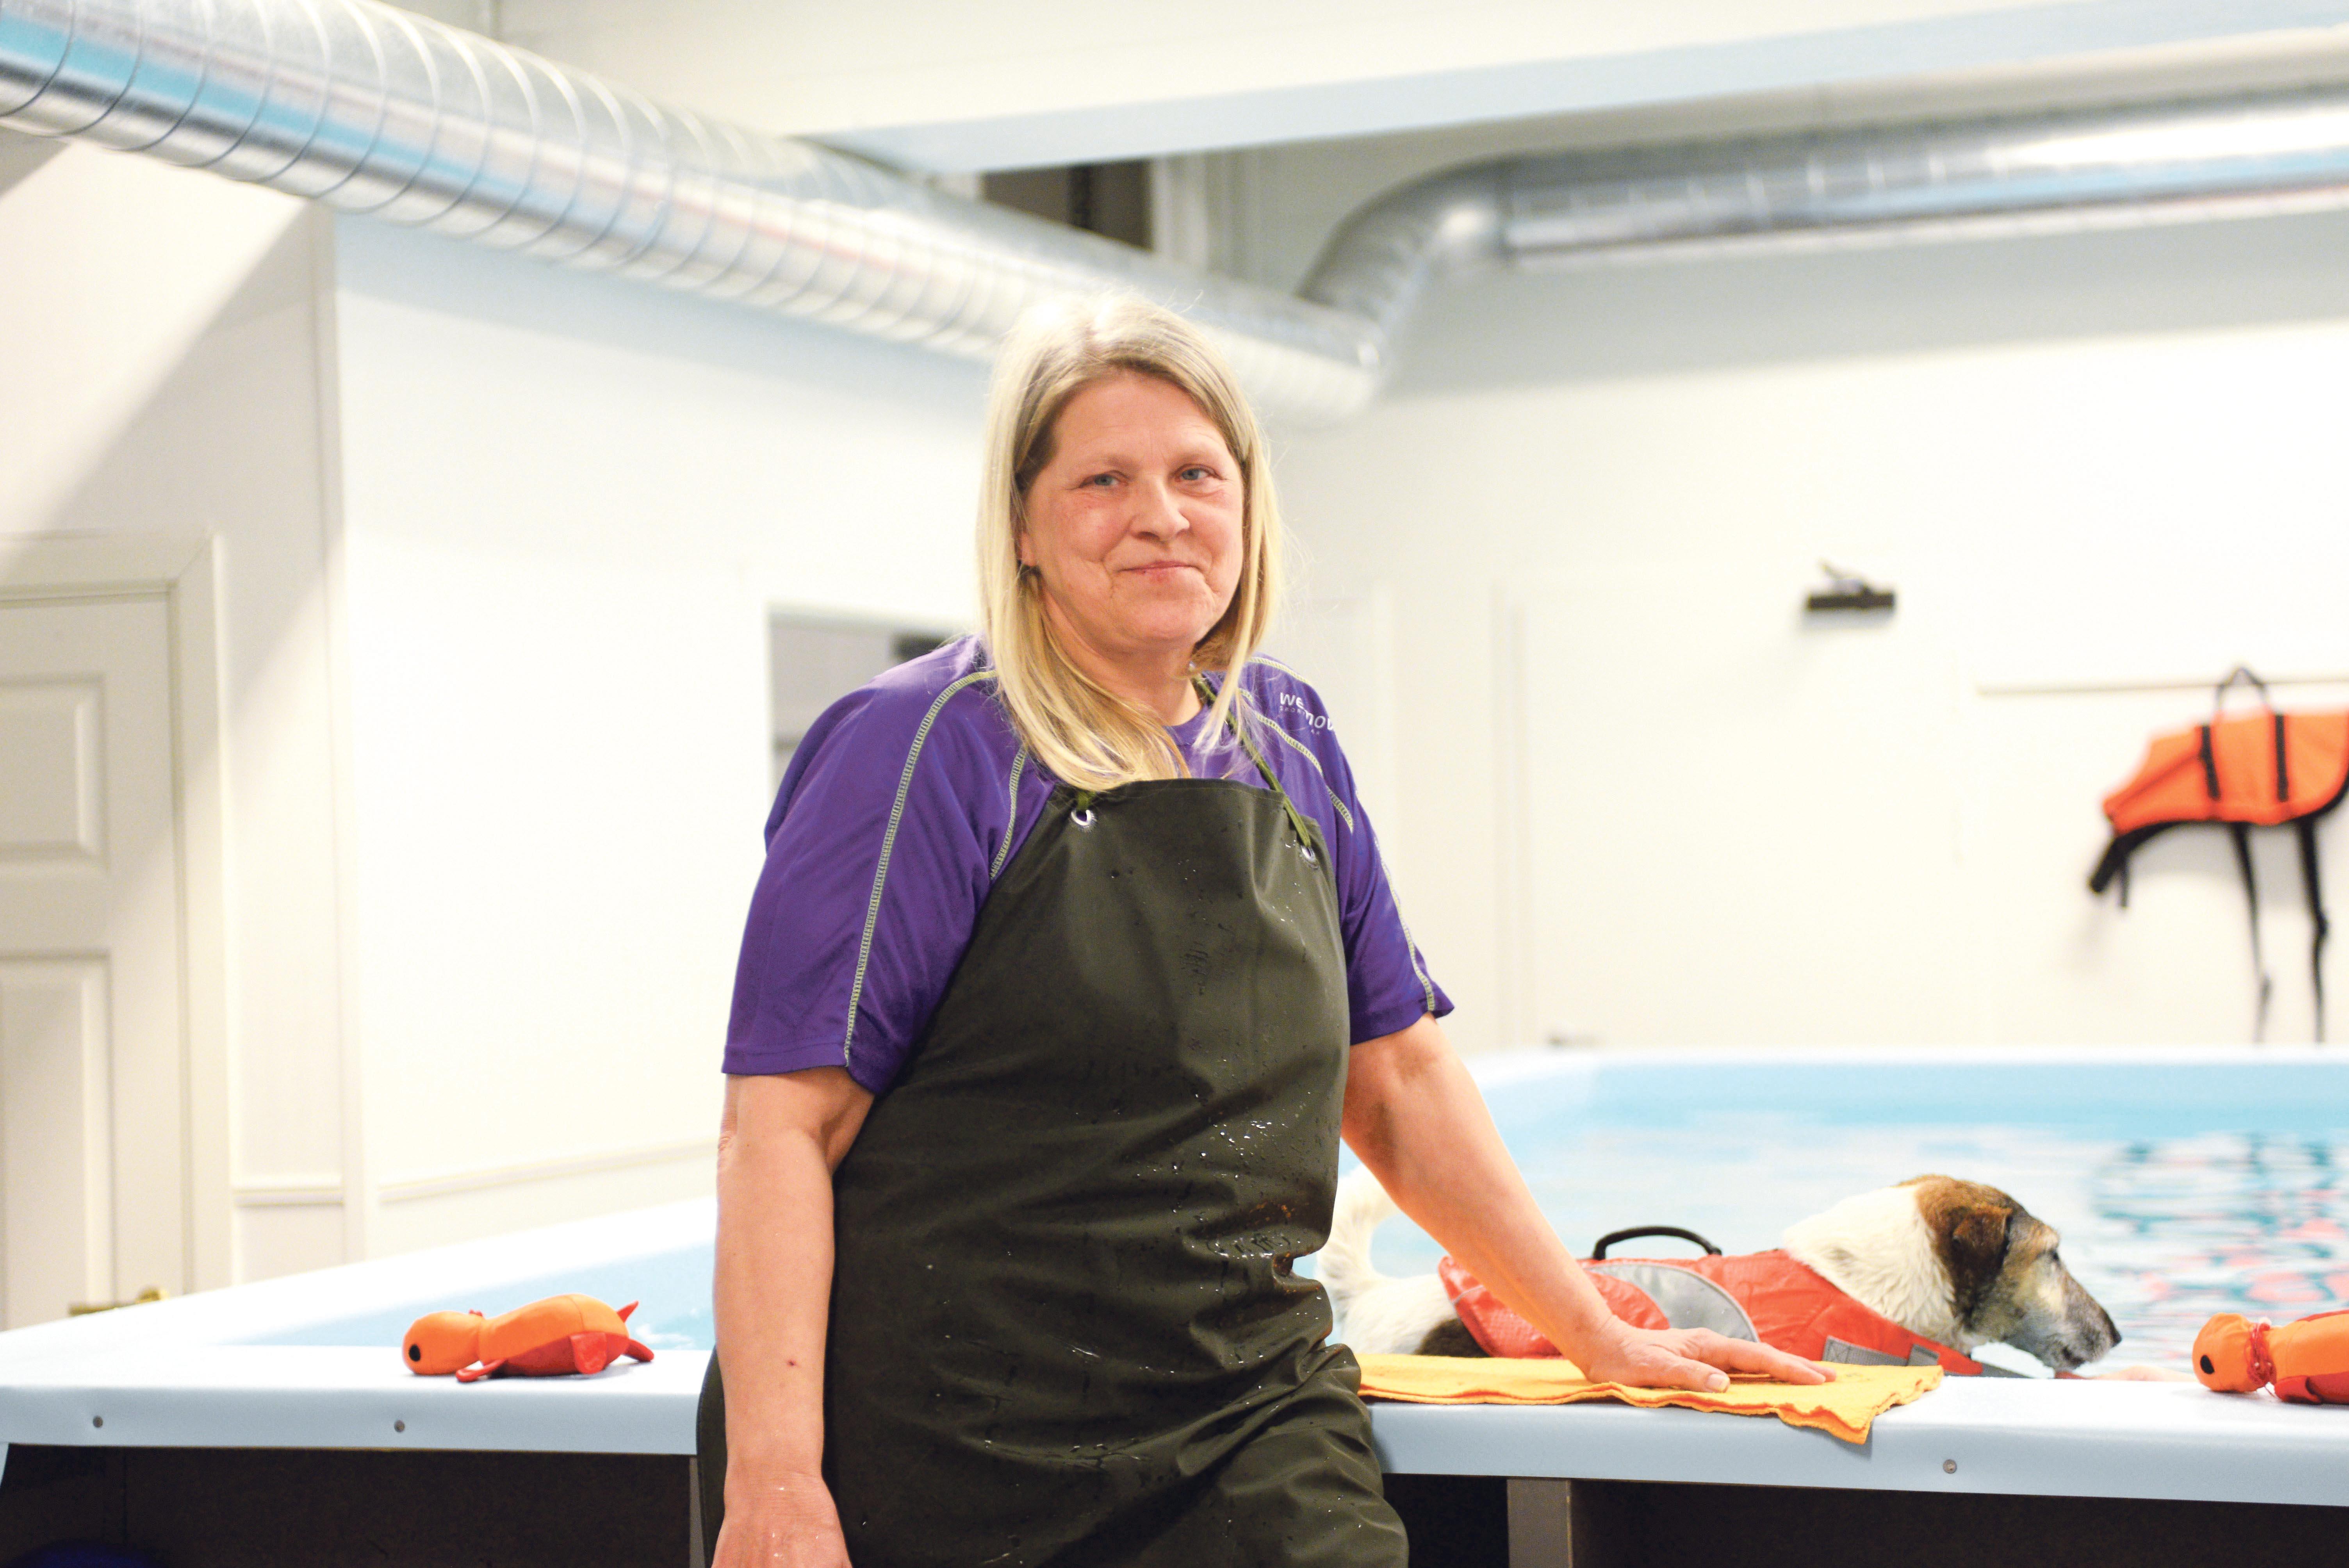 HUND: Bente Dahl Driver Hundens Multihus Sammen Med Trine Lill Trondsen.